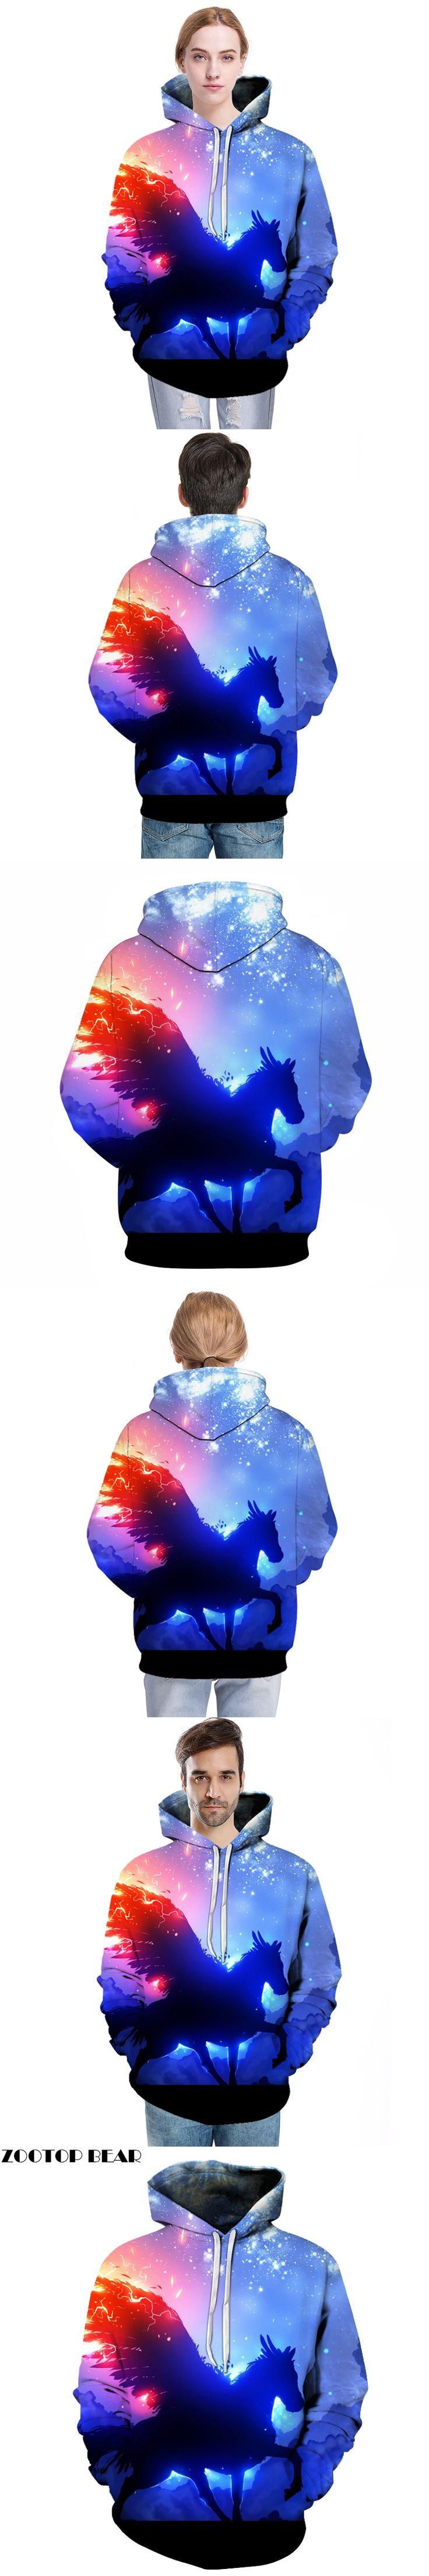 Galaxy Unicorn Printed Hoodies Men Women 3D Sweatshirts Unisex Hooded Pullover Brand Hoodie Casual Tracksuits Boy Jackets Coat